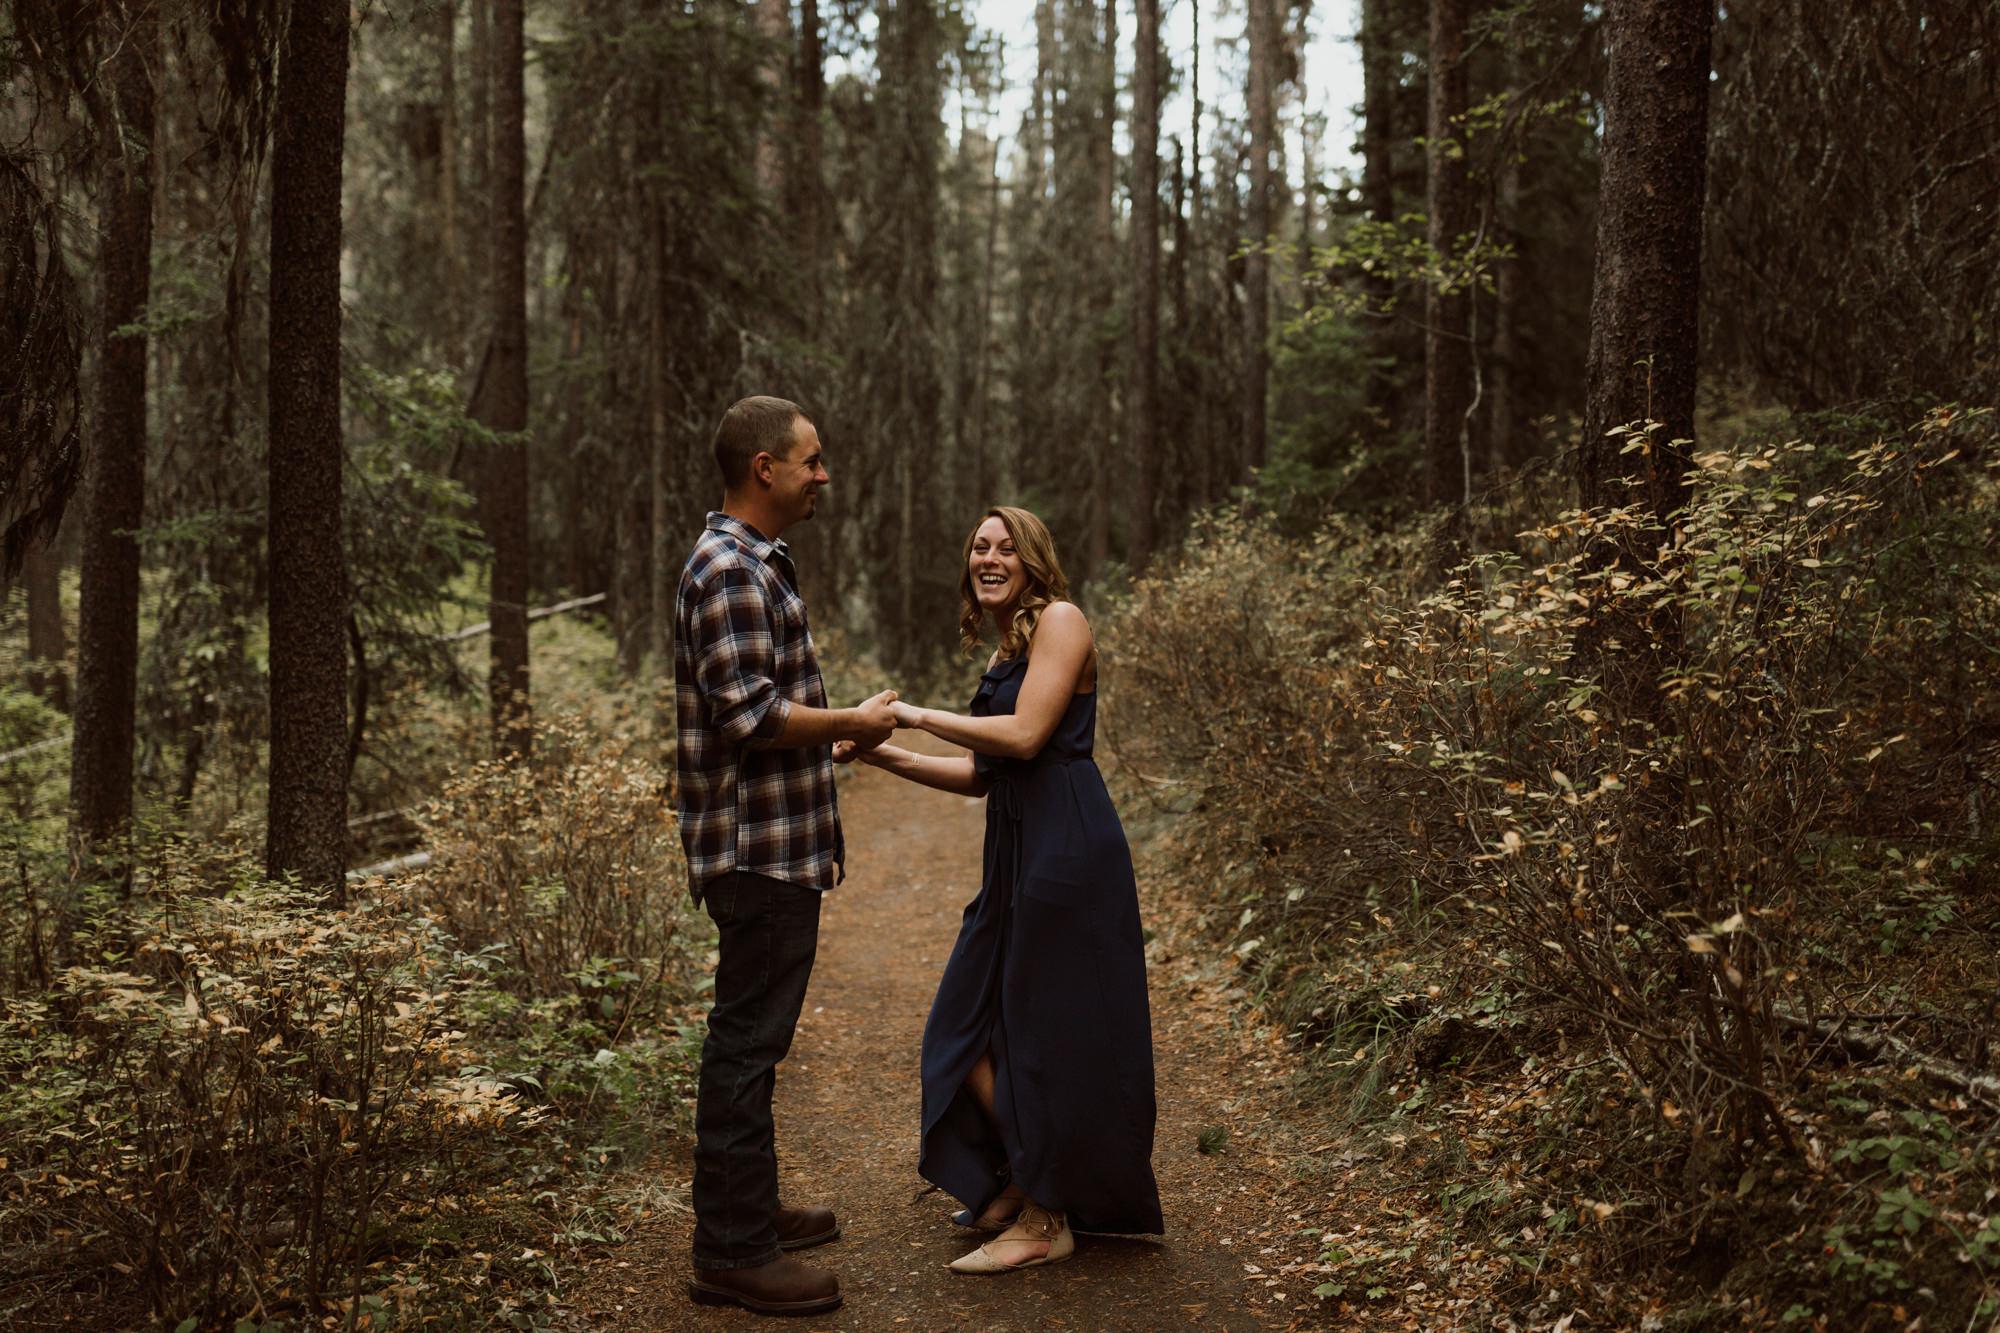 banff-engagements-destination-wedding-photographer-39.jpg